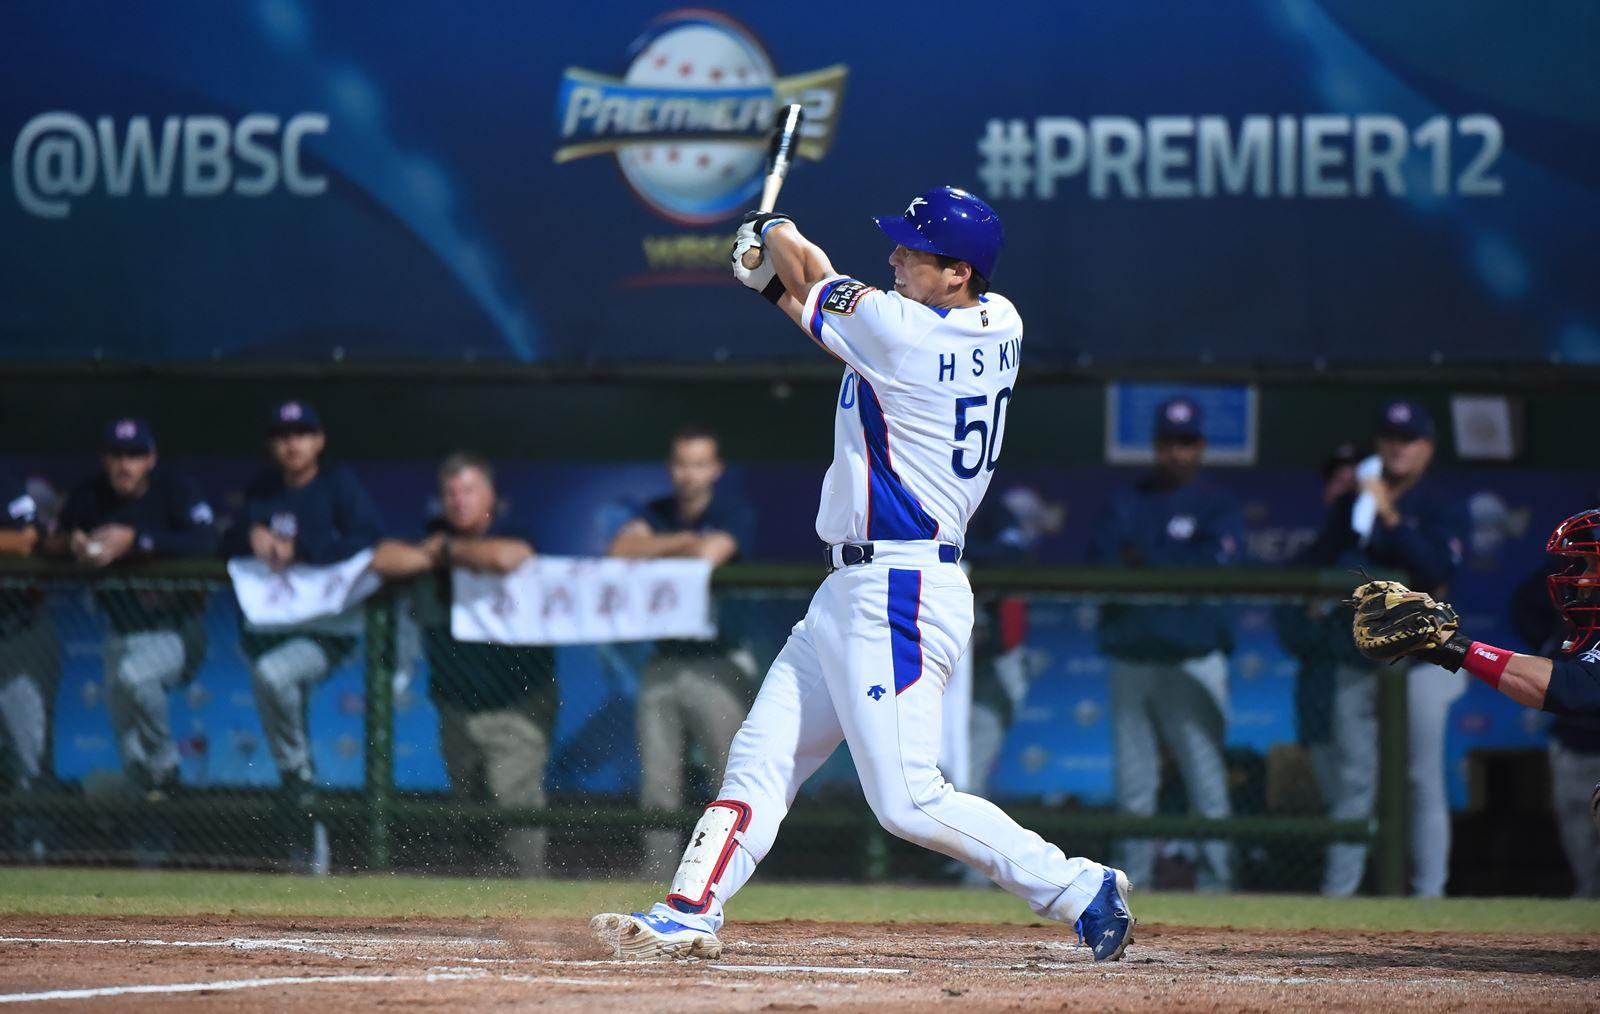 Premier12 MVP Hyun-soo Kim (KOR) signs with MLB's Baltimore Orioles